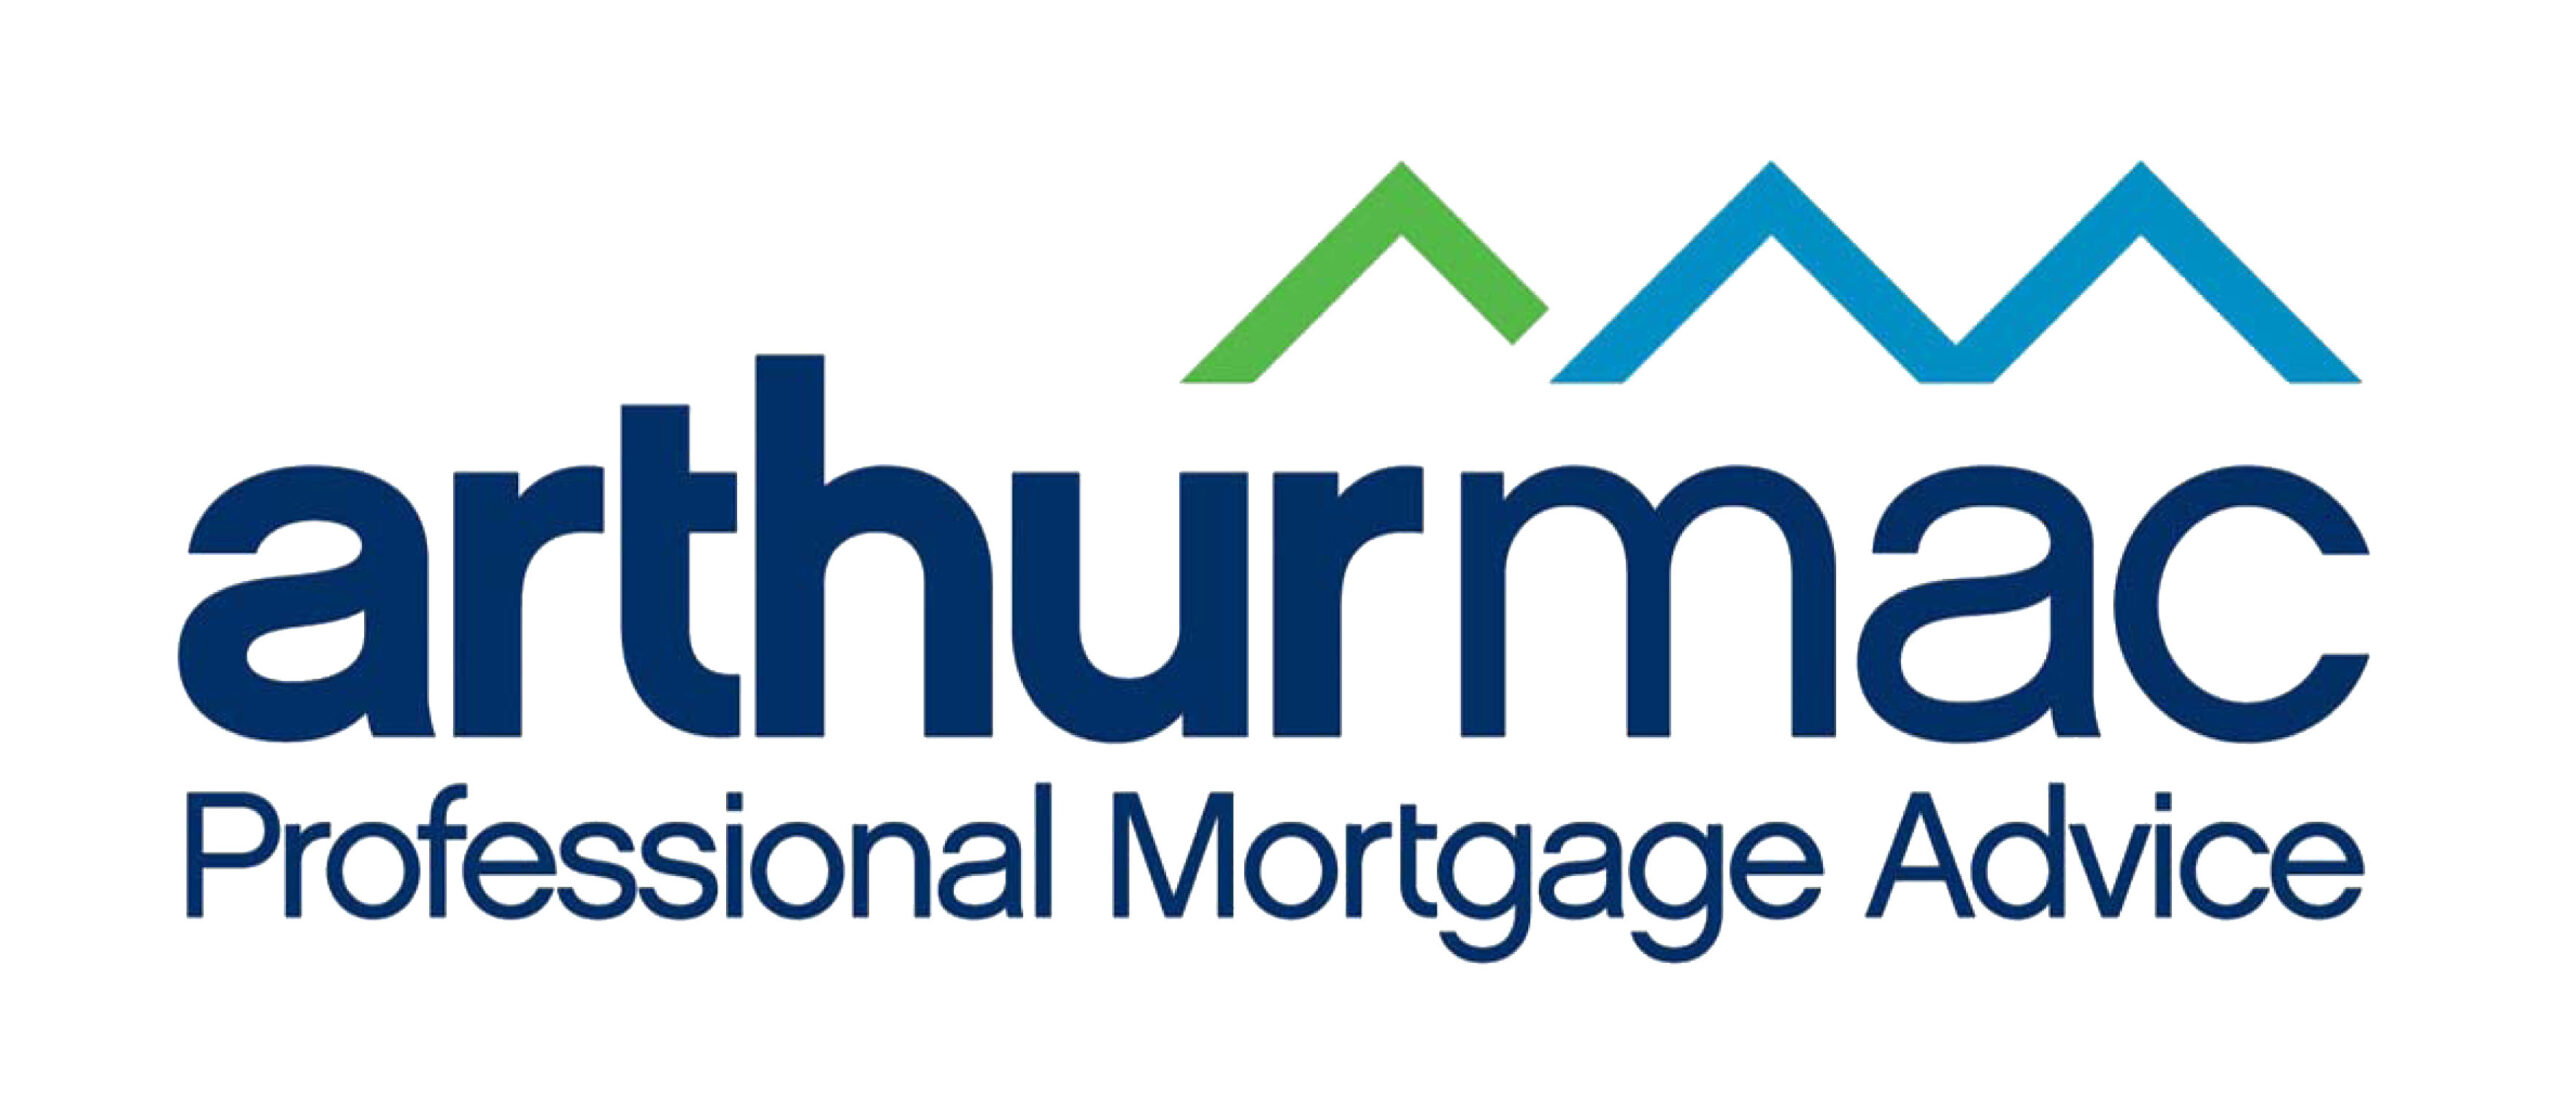 Arthurmac Professional Mortgage Advice